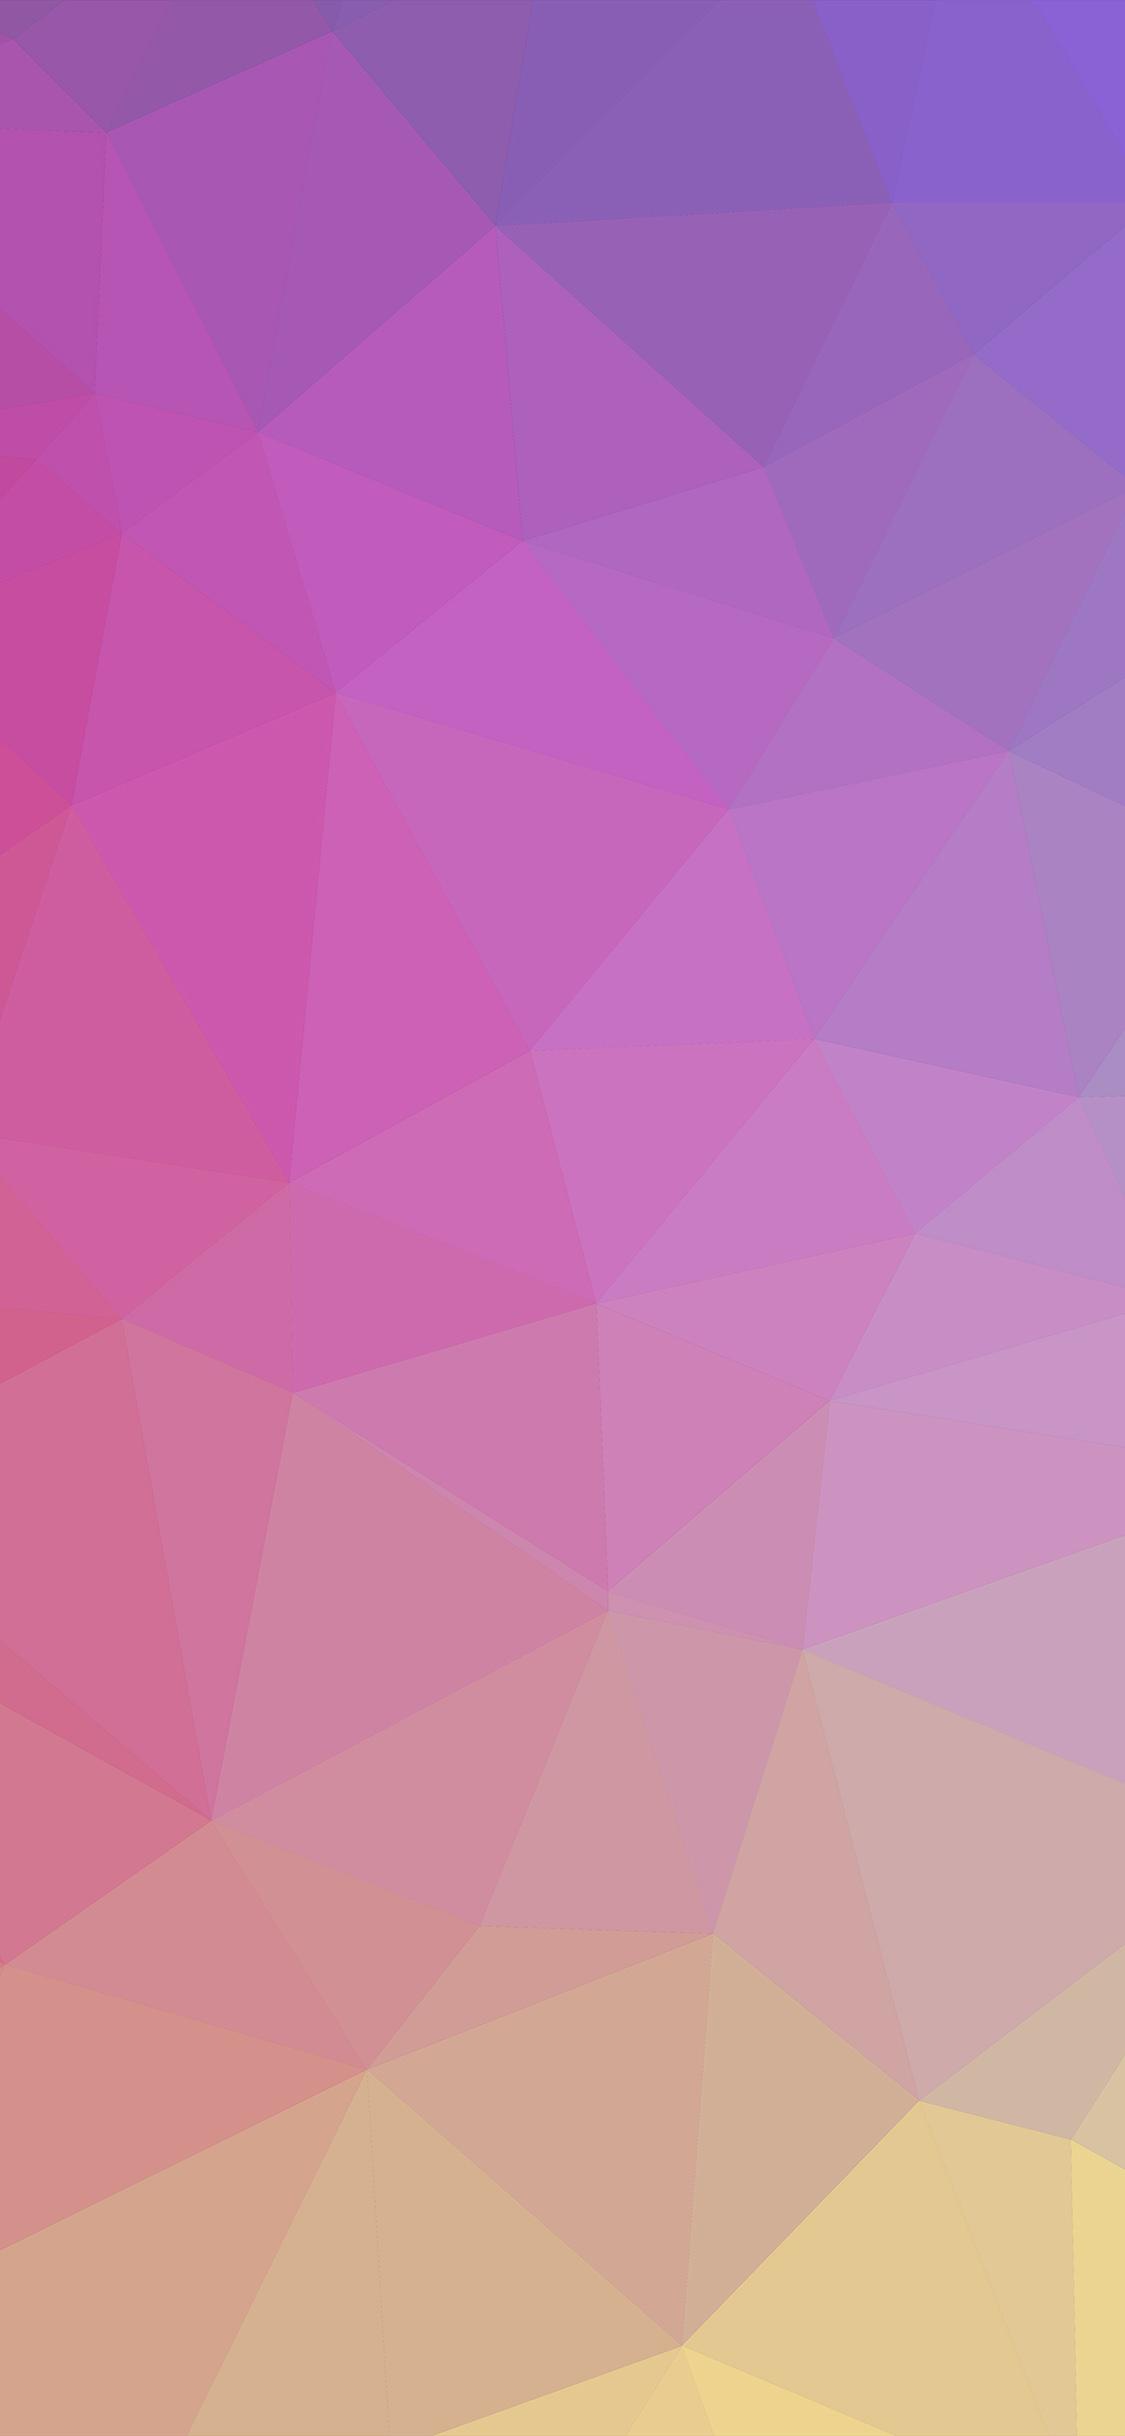 Vk65 Samsung Galaxy Polyart Pastel Pink Yellow Pattern Papers Co